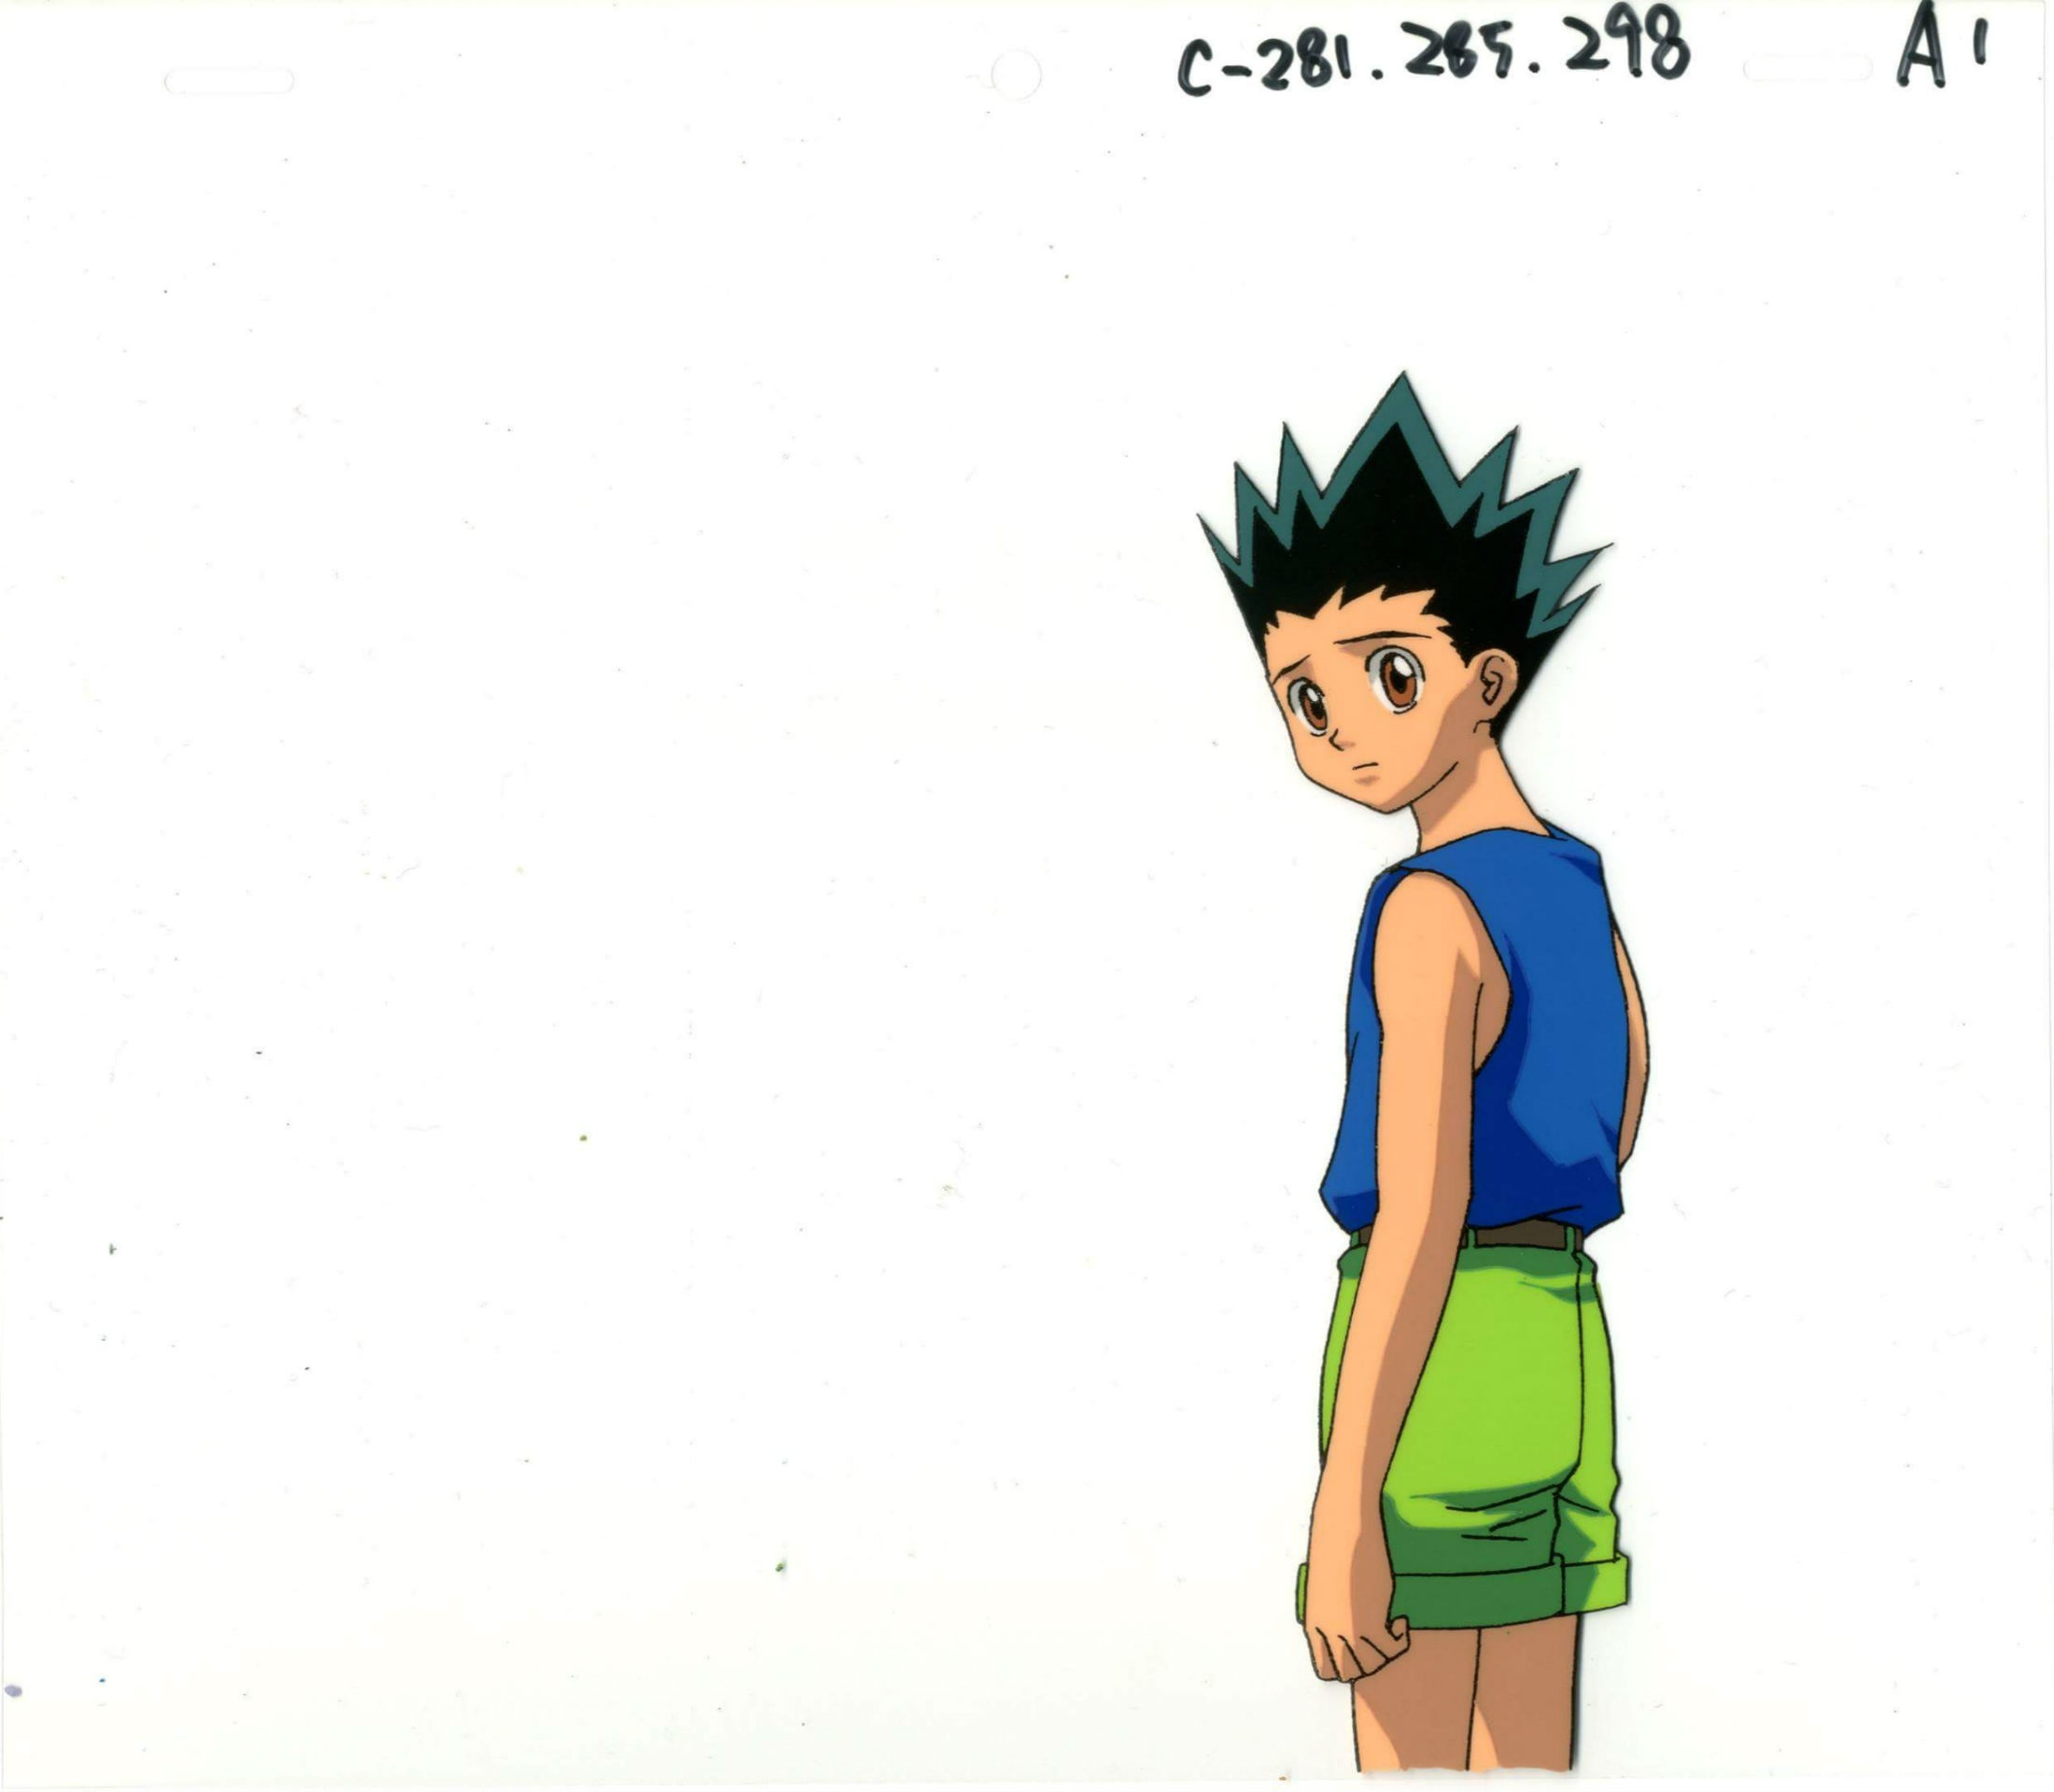 2200x1919 anime cel hunter x hunter